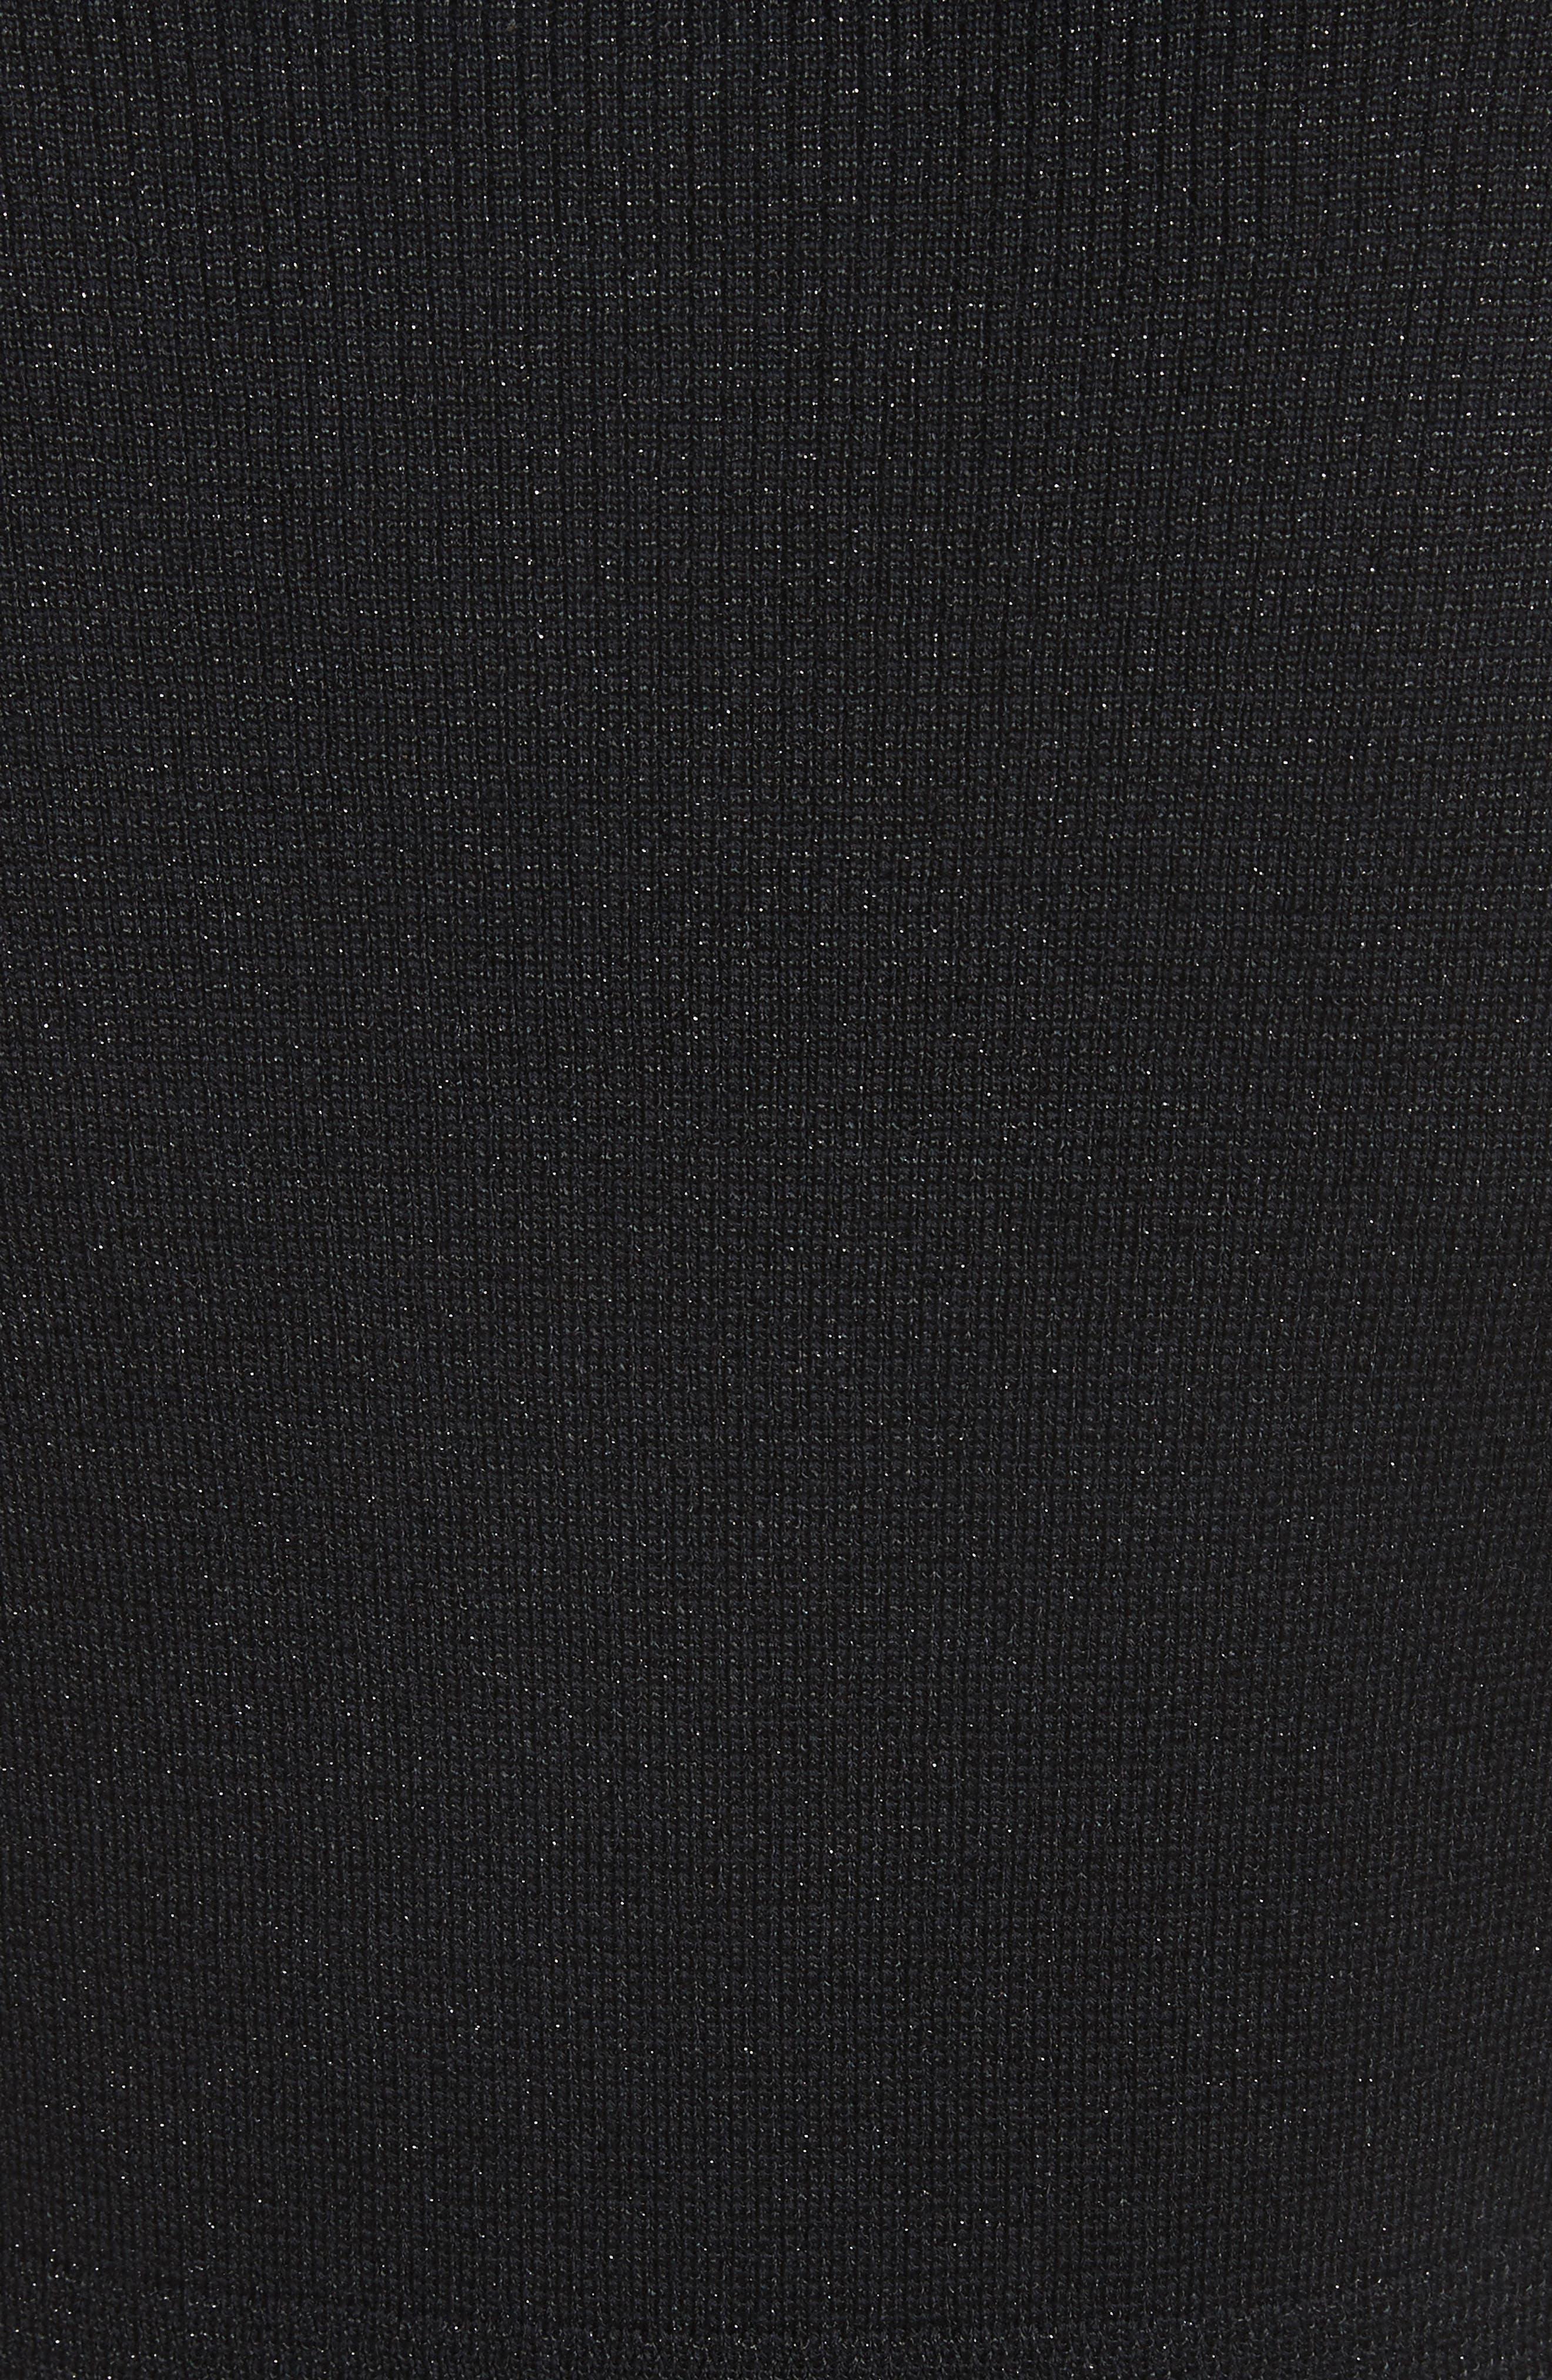 Scalloped Metallic Knit Cardigan,                             Alternate thumbnail 6, color,                             Caviar Multi